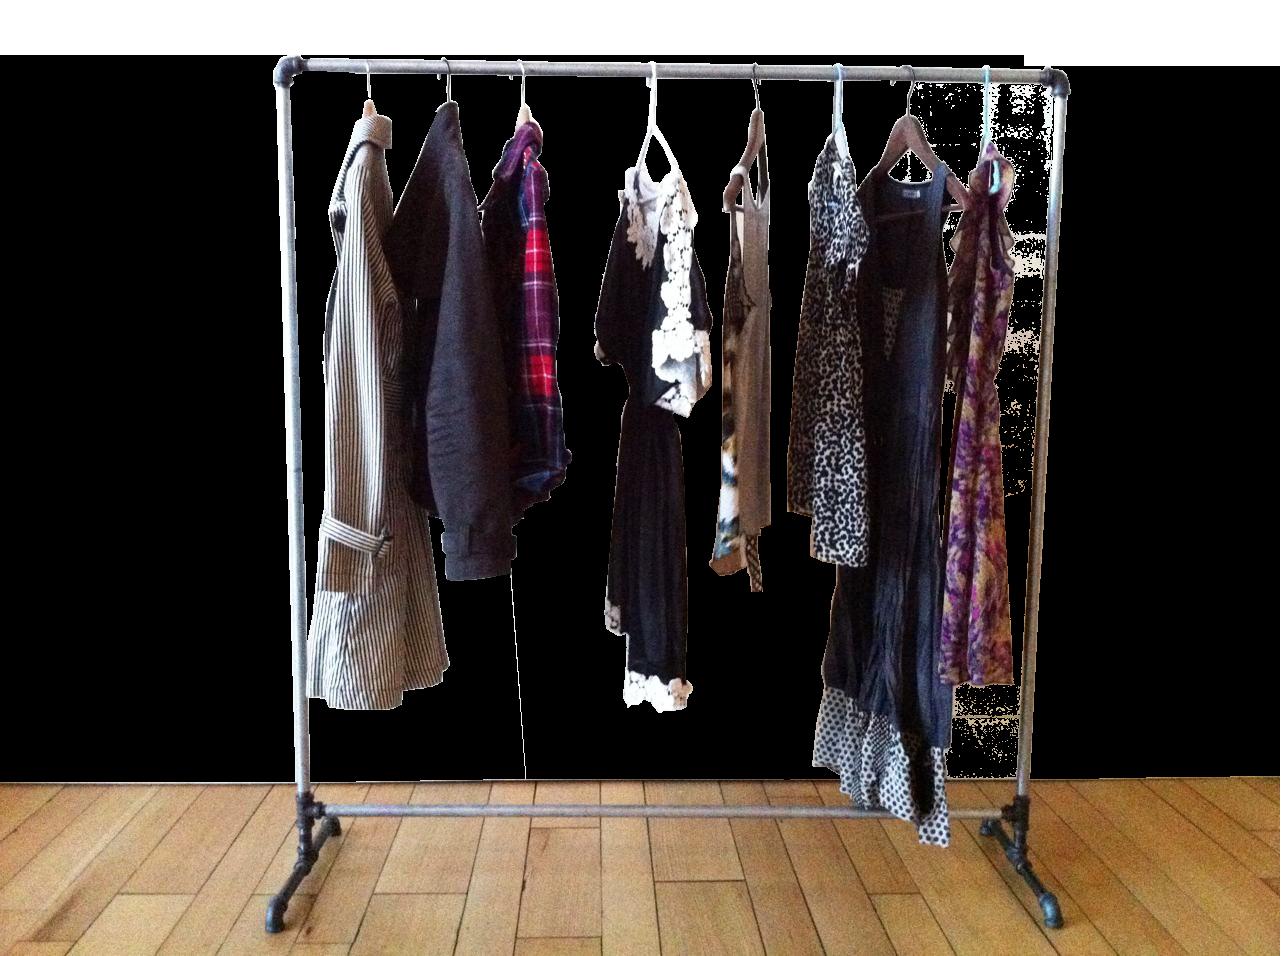 Clothing clipart clothing rack. Veev blog wardrobe management